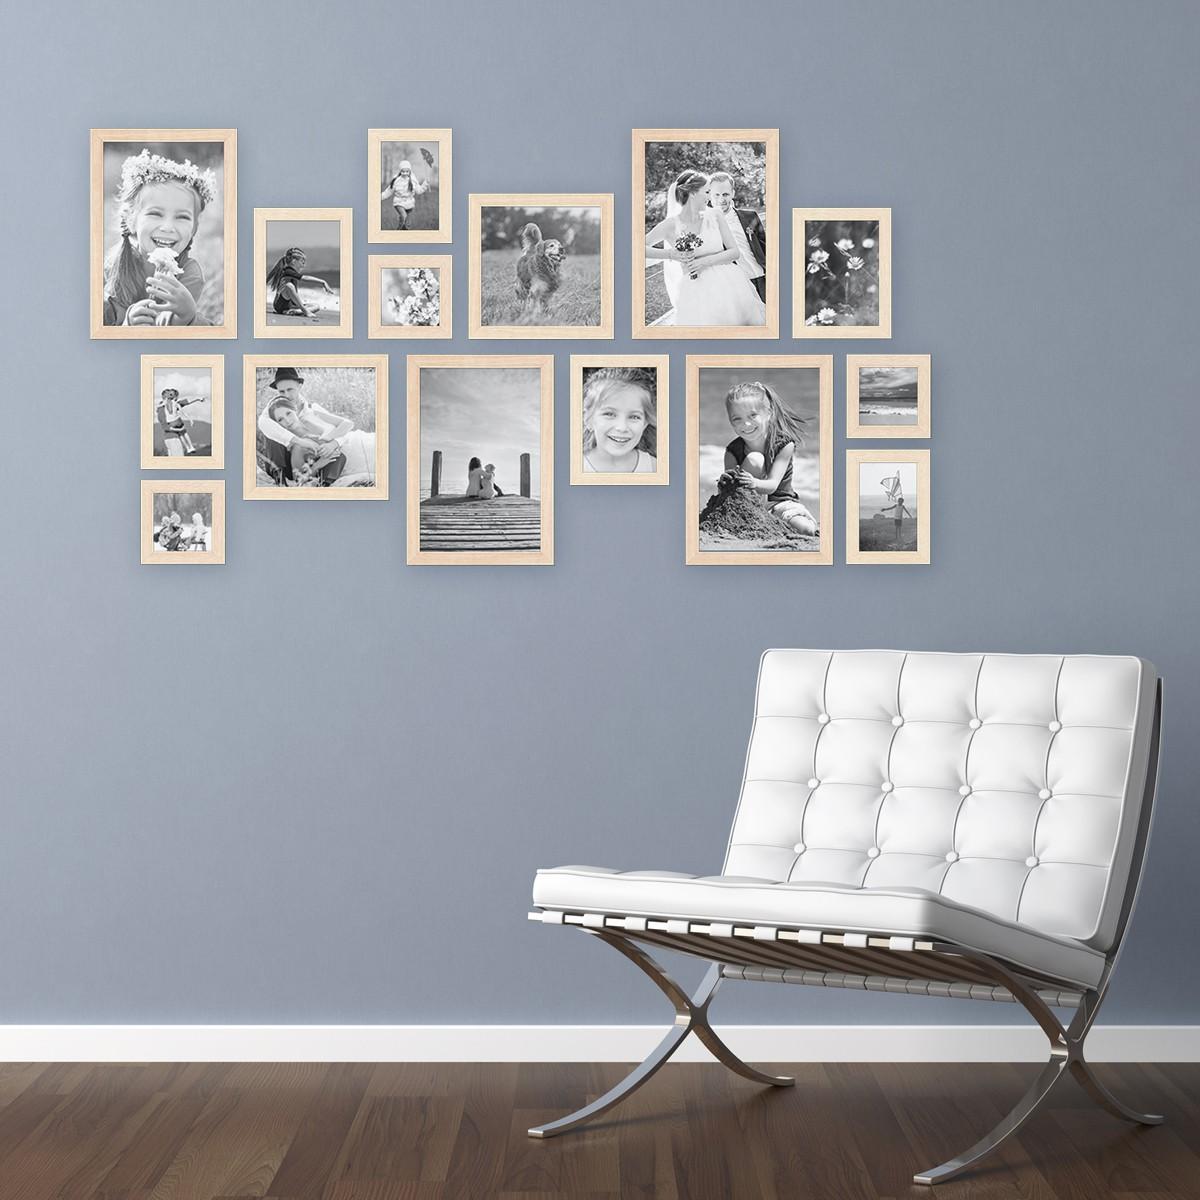 ber hmt bilderrahmen verschiedene gr en bilder benutzerdefinierte bilderrahmen ideen. Black Bedroom Furniture Sets. Home Design Ideas